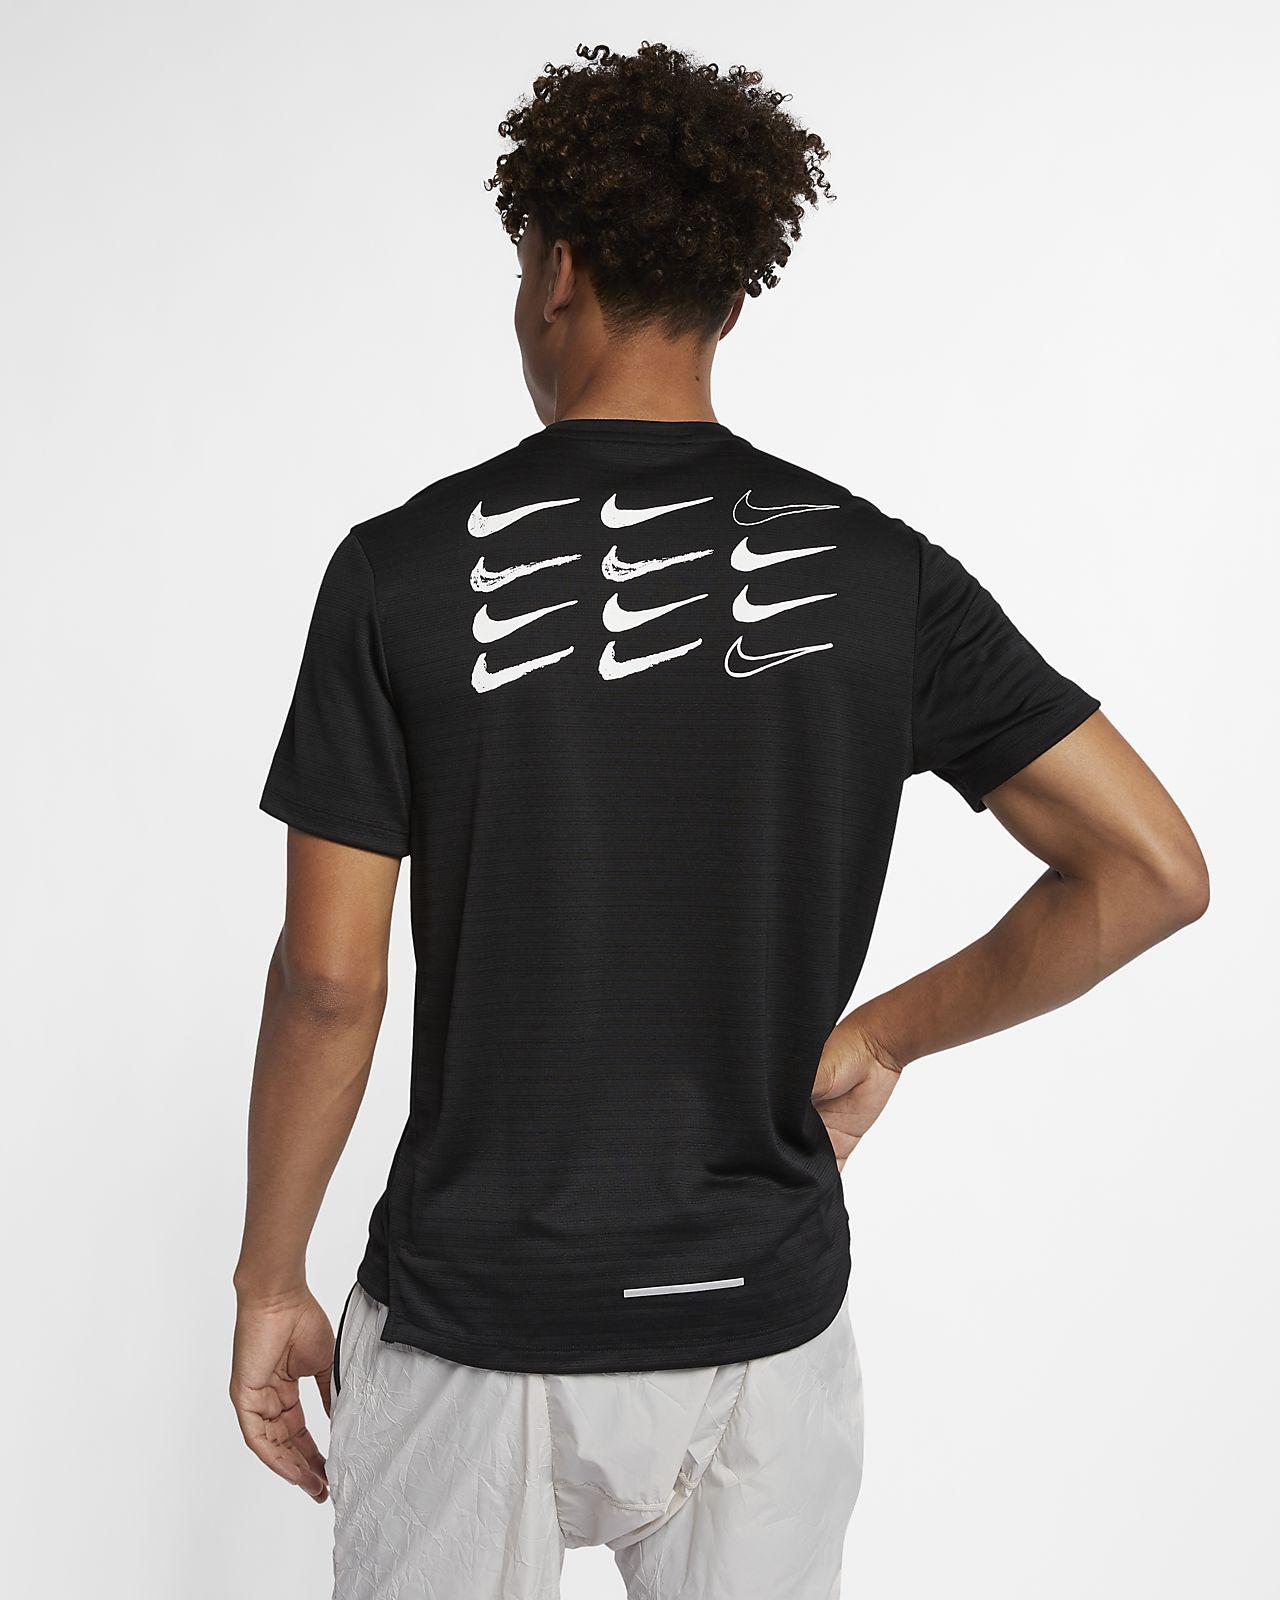 6e435f4c Nike Dri-FIT Miler Men's Short-Sleeve Graphic Running Top. Nike.com LU